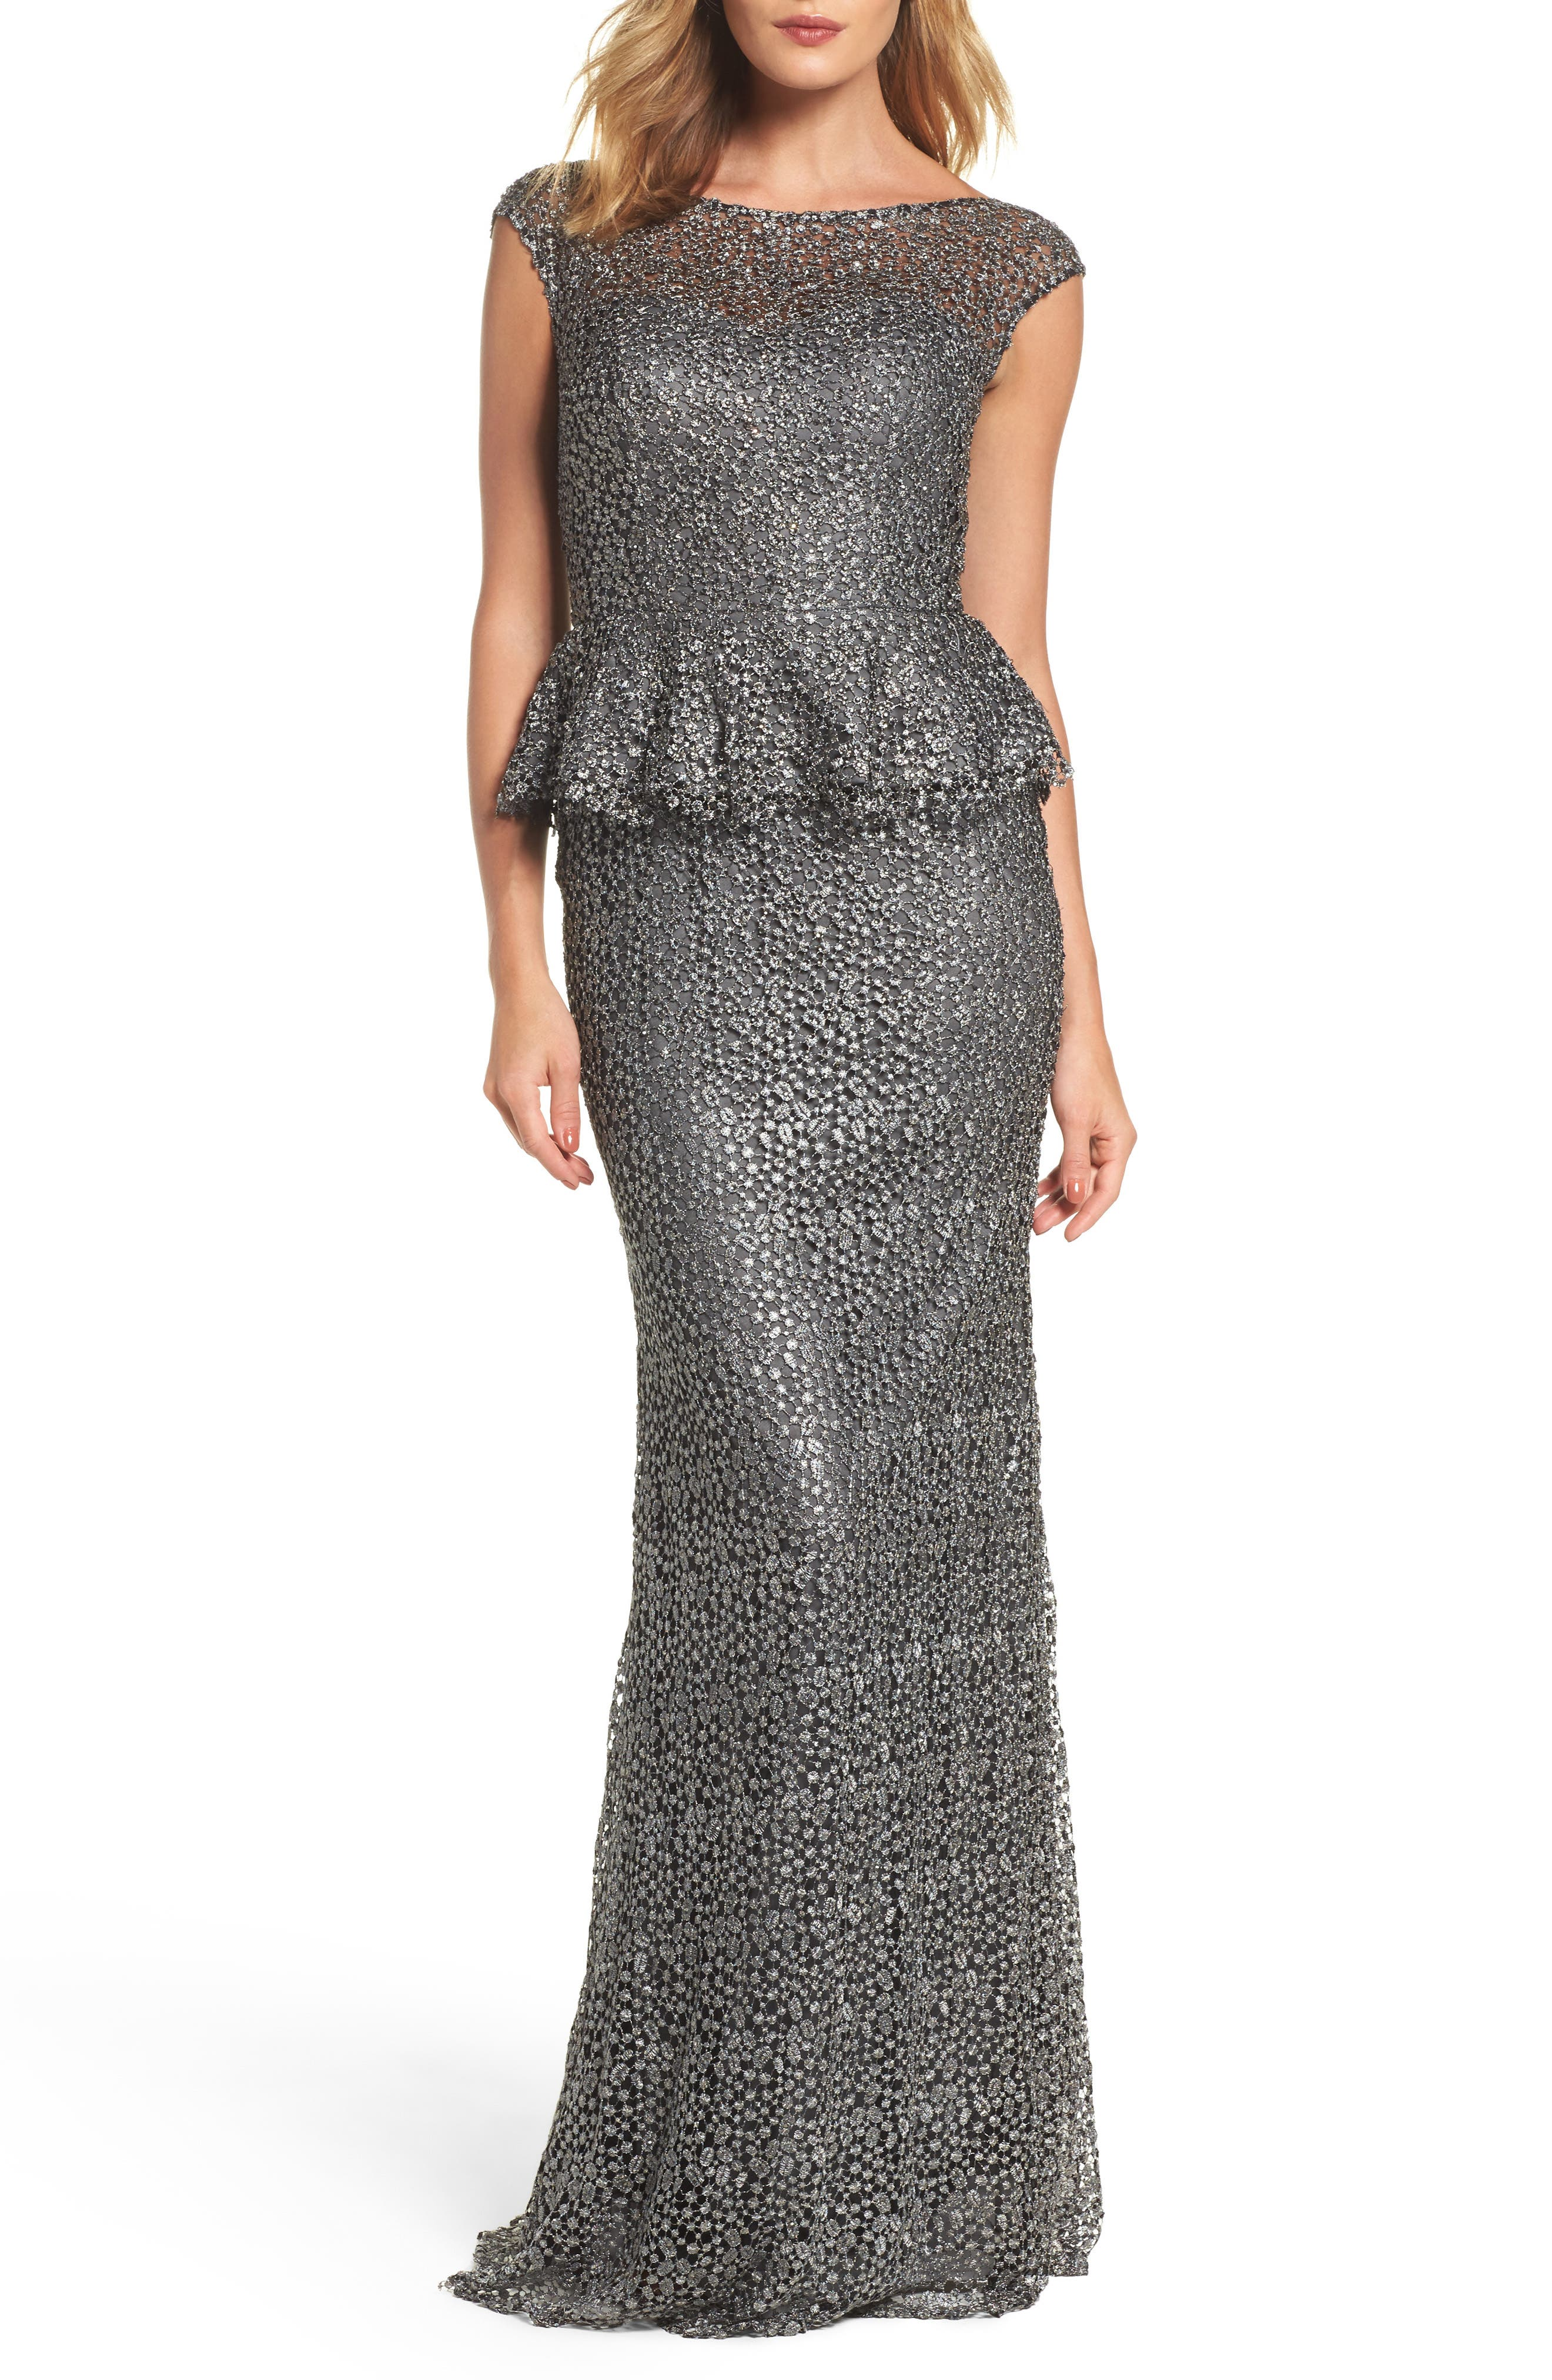 La Femme Embellished Lace Peplum Gown, Grey